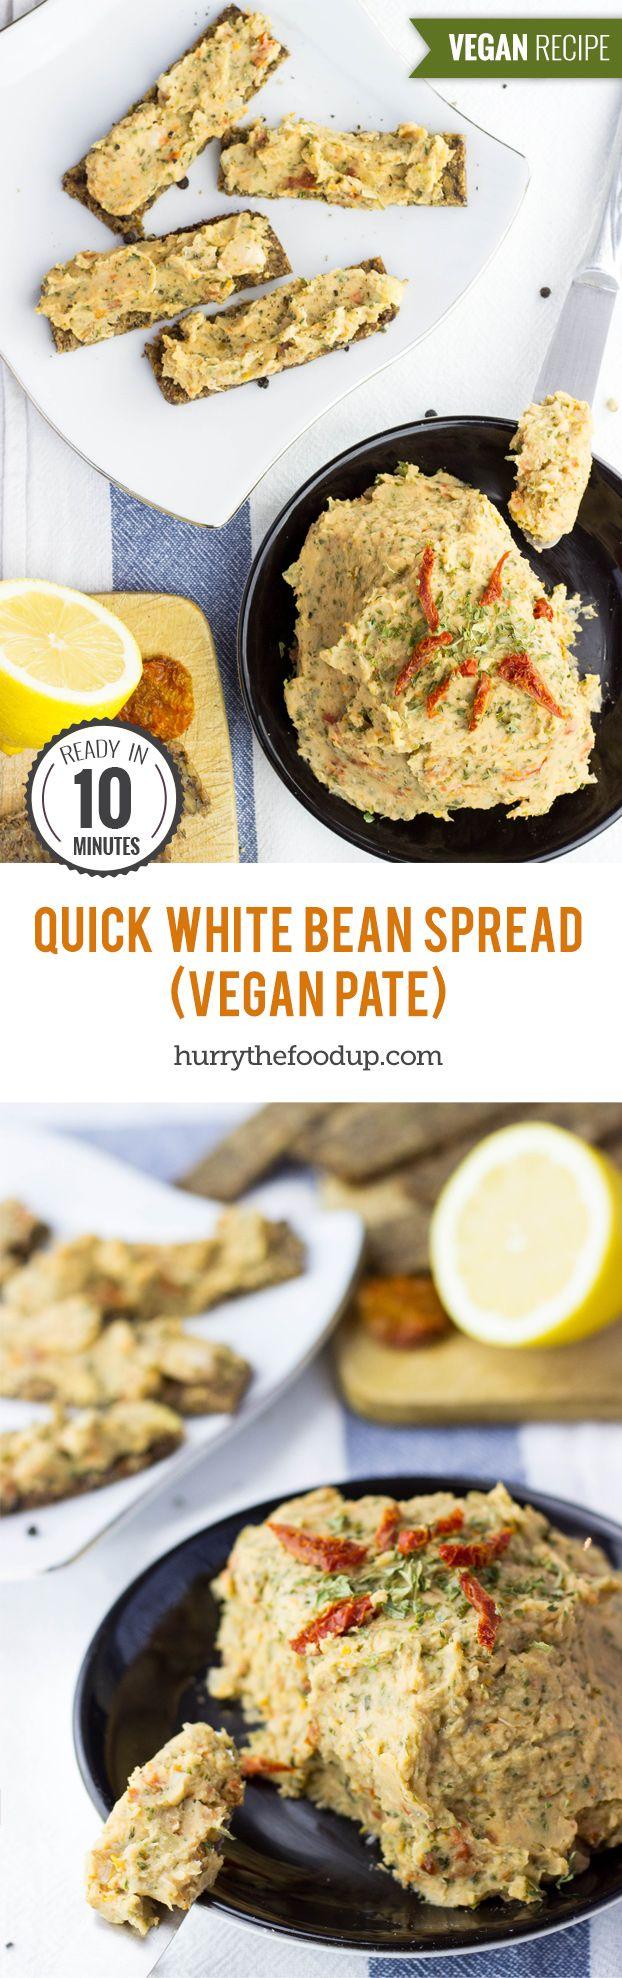 Quick White Bean Spread (vegan pâté) #vegan | hurrythefoodup.com